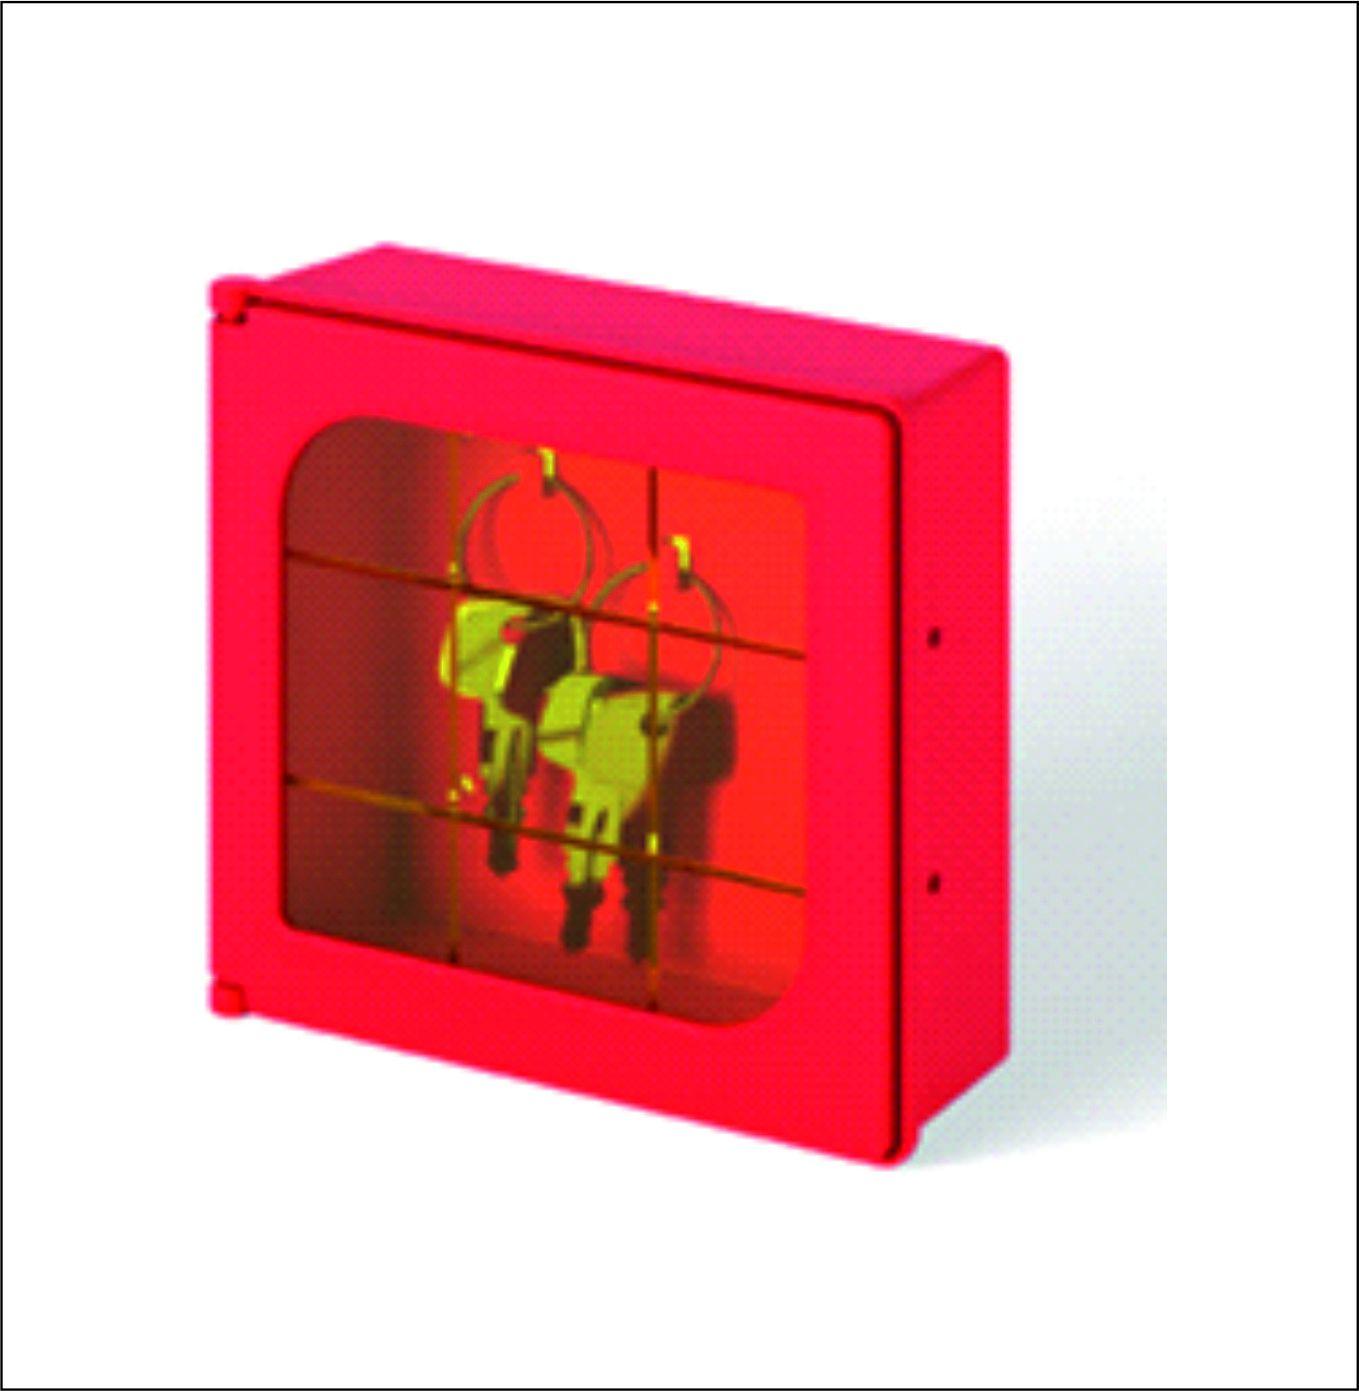 Sarkana stiklota plastmasas atslēgu kastīte